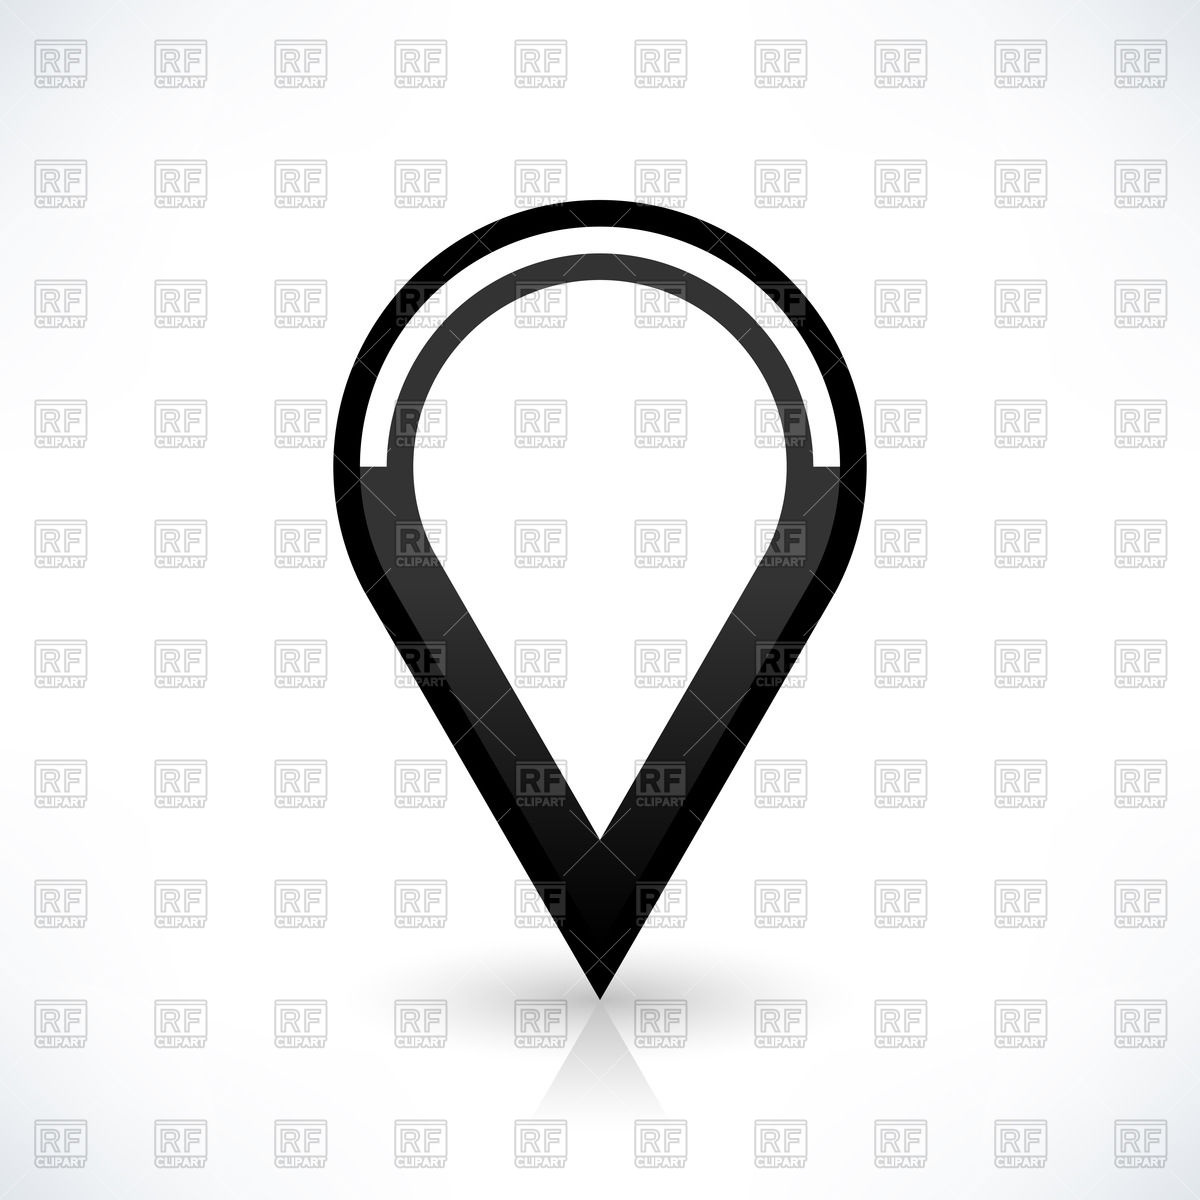 1200x1200 Drop Shaped Black Map Pin Vector Image Vector Artwork Of Icons